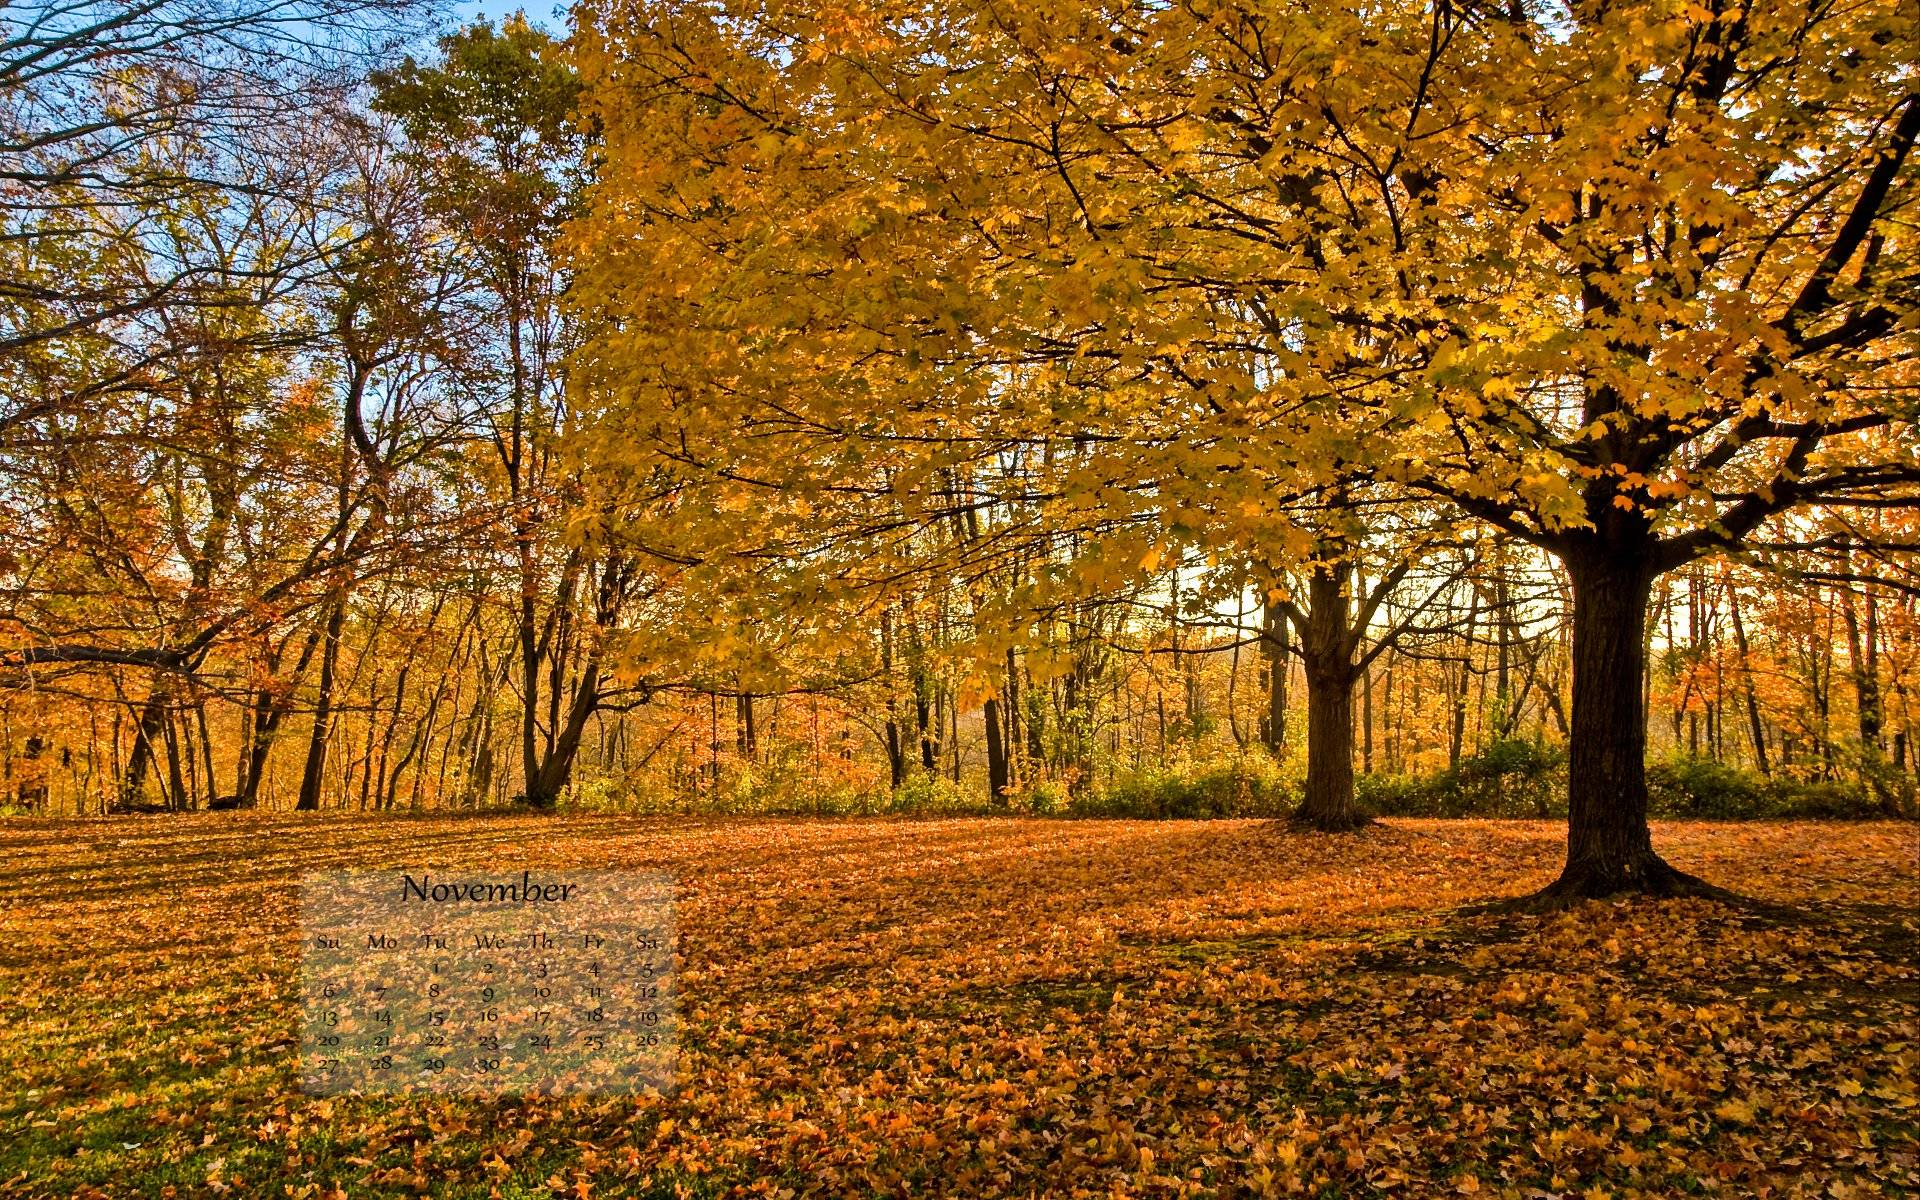 Get your FREE November Fall Desktop Wallpaper